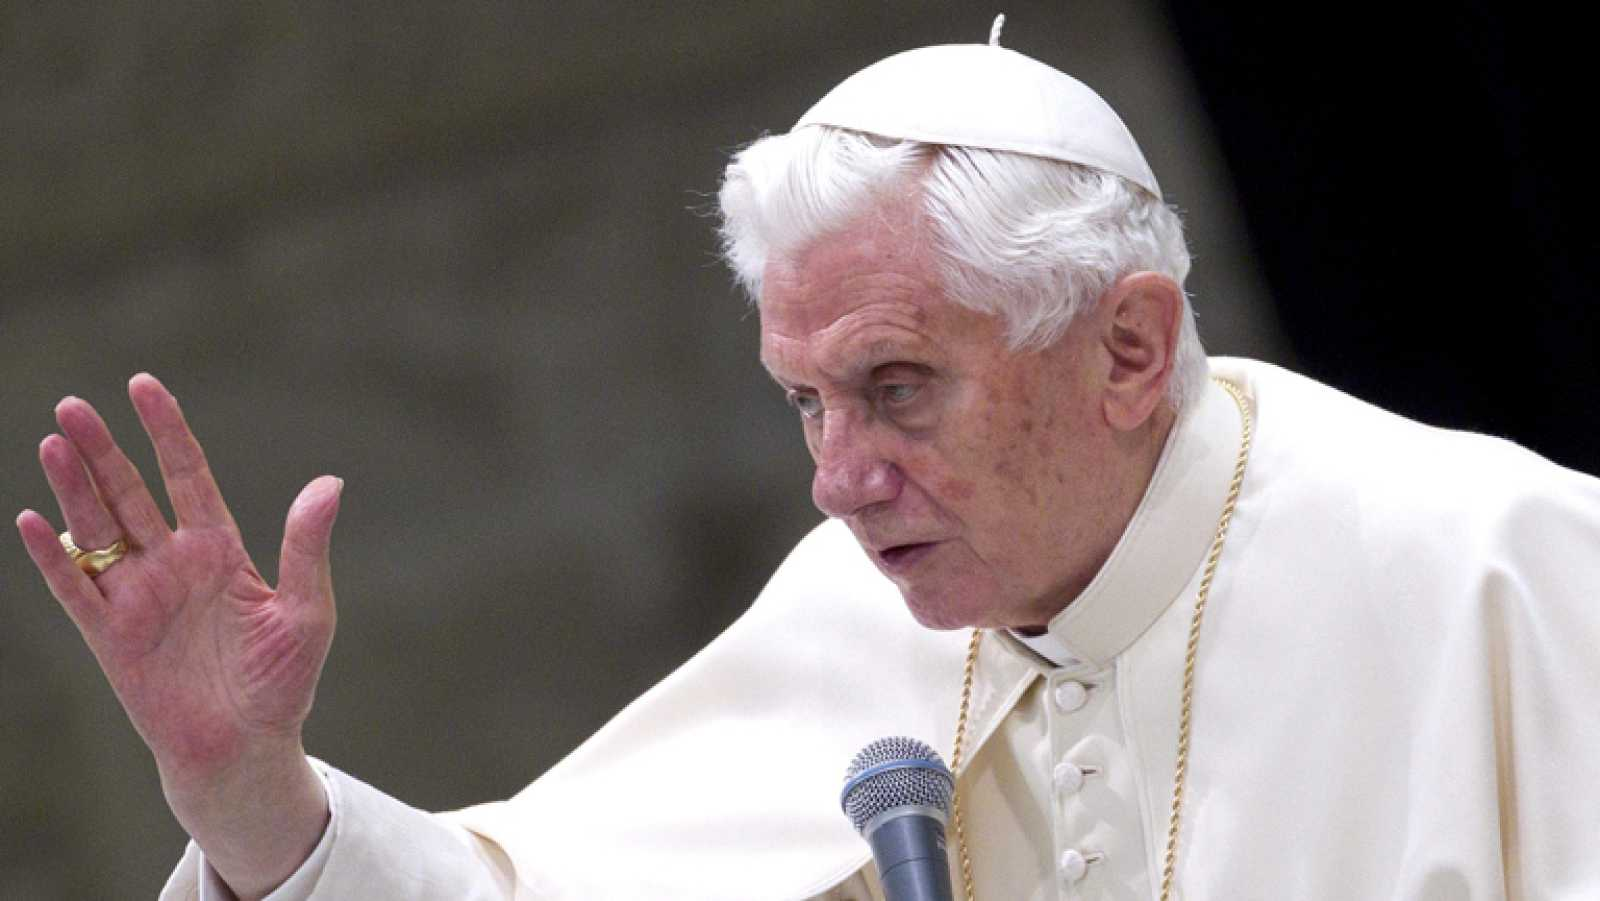 El papa Benedicto XVI ya tiene Twitter